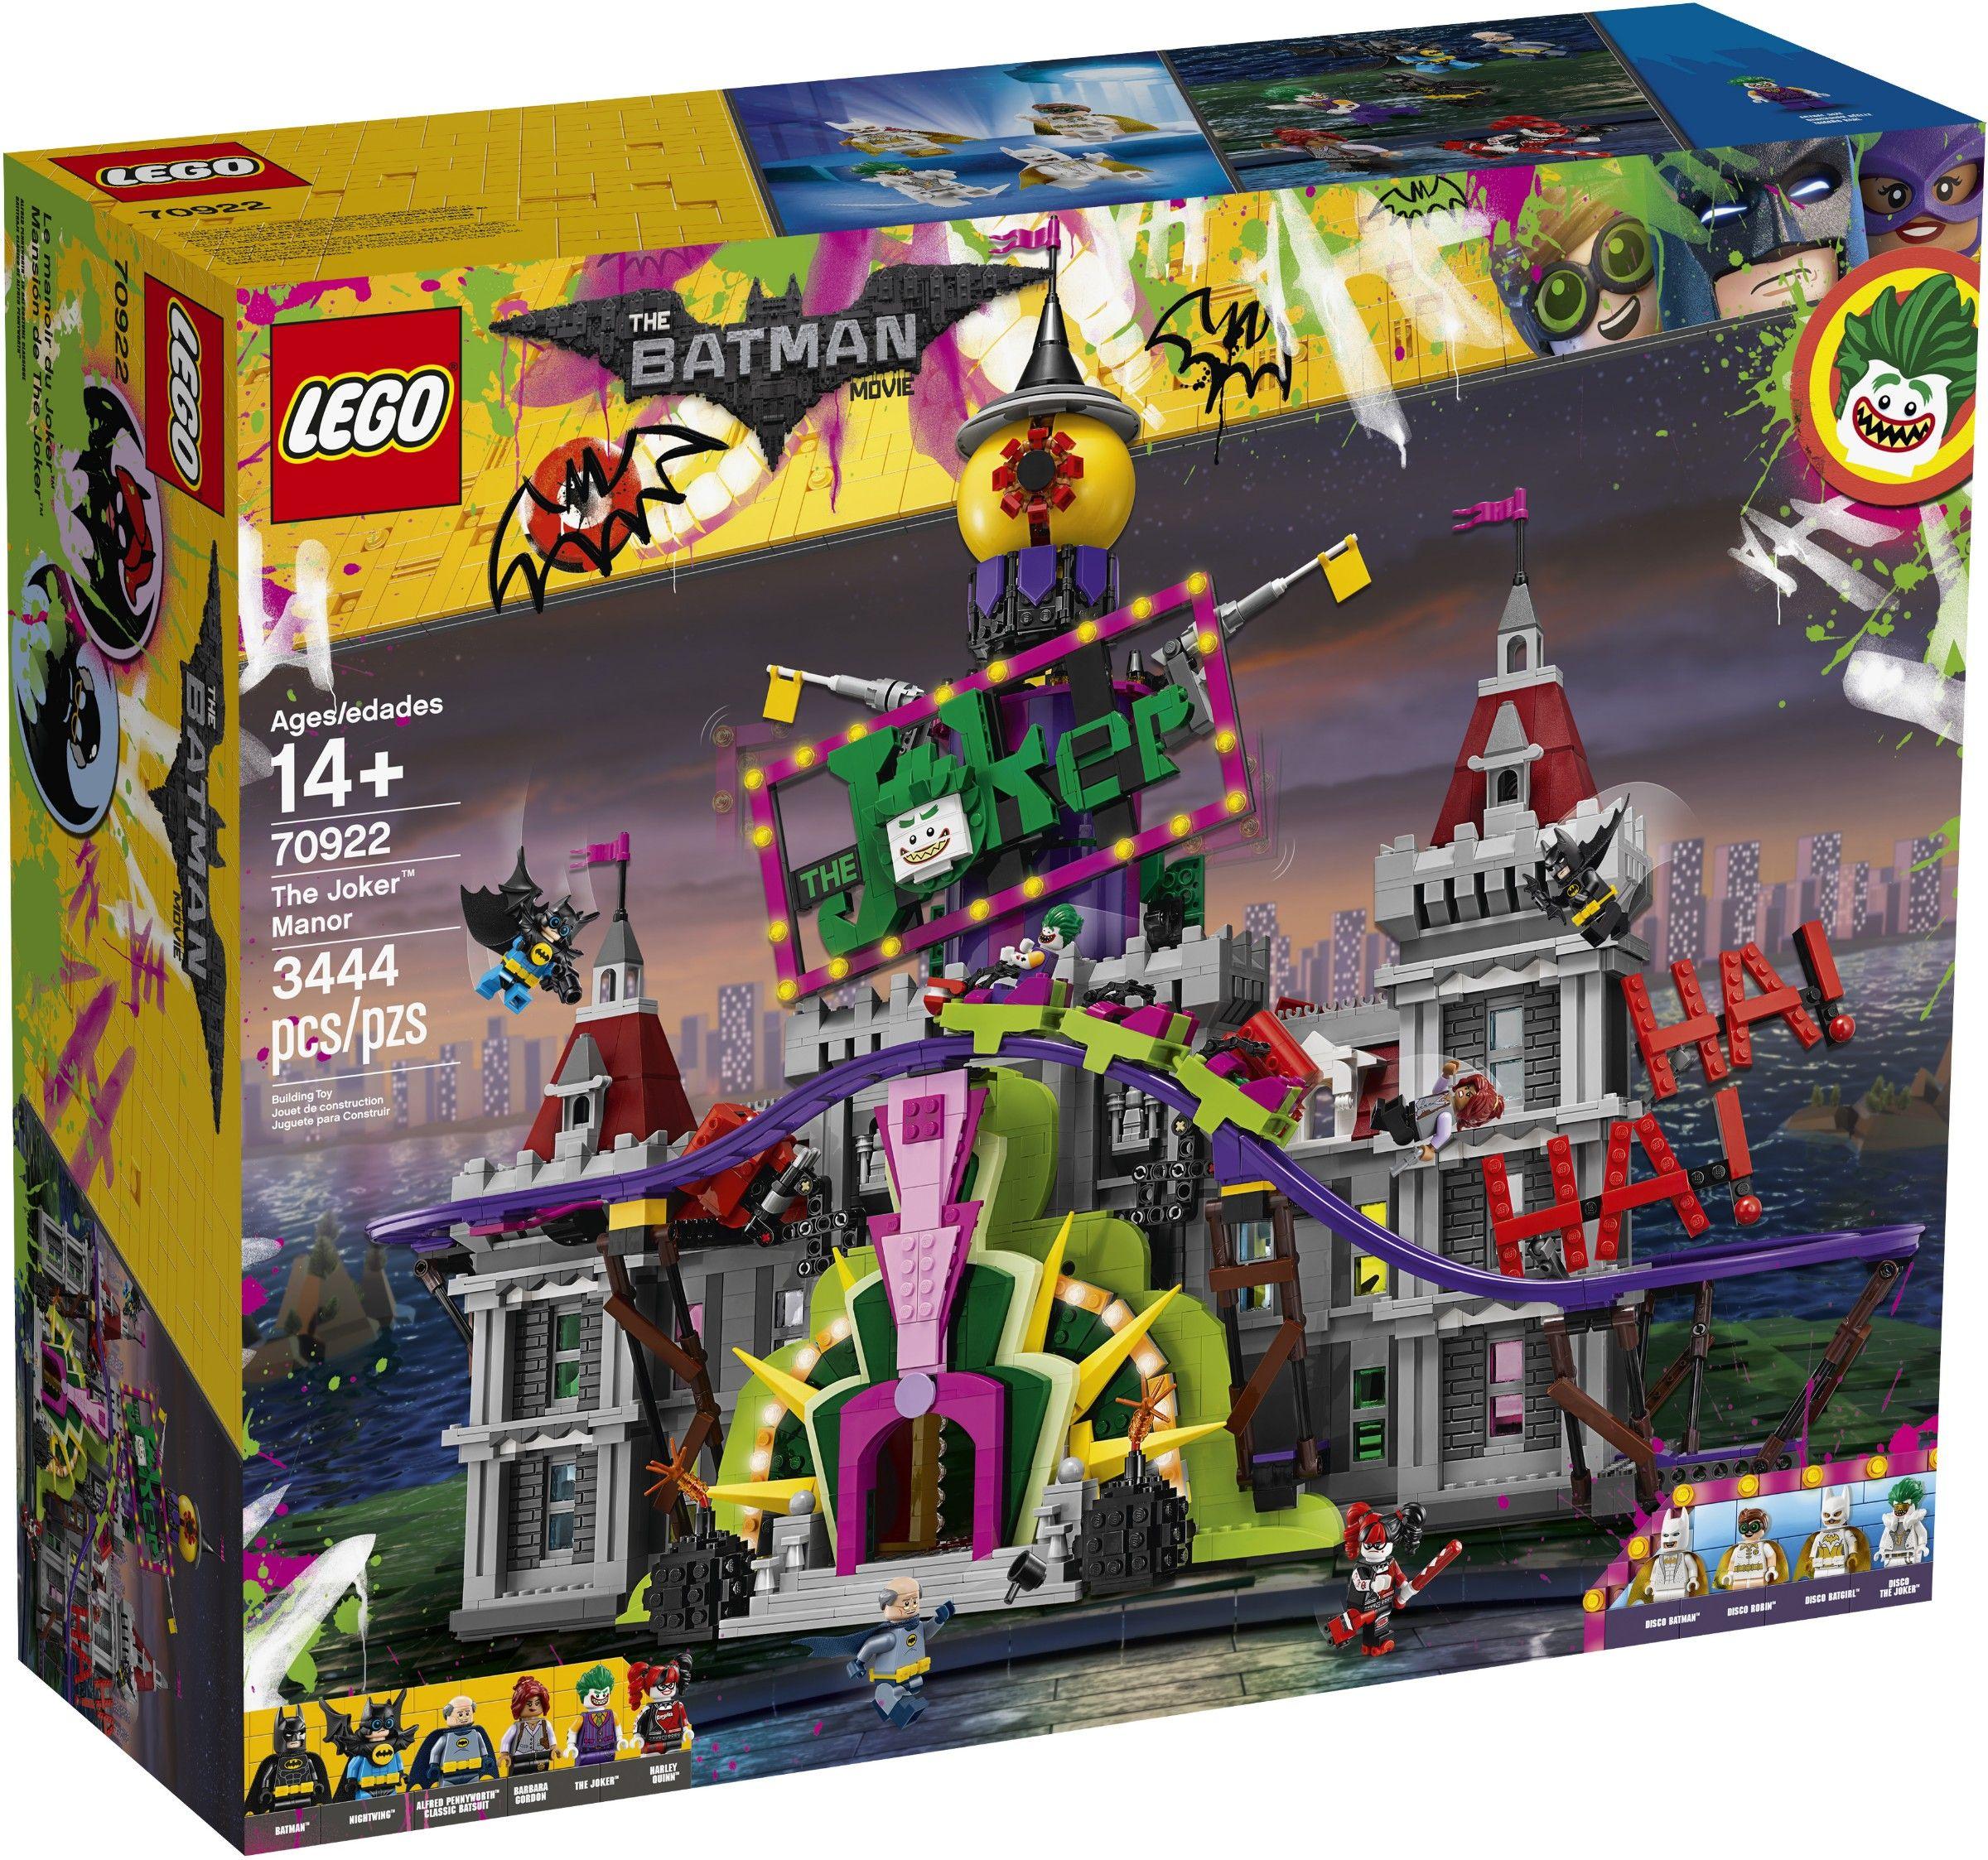 LEGO Bau- & Konstruktionsspielzeug 70815 lego new original DECAL STICKER sheet AUFKLEBER Lego Movie Batman Baukästen & Konstruktion